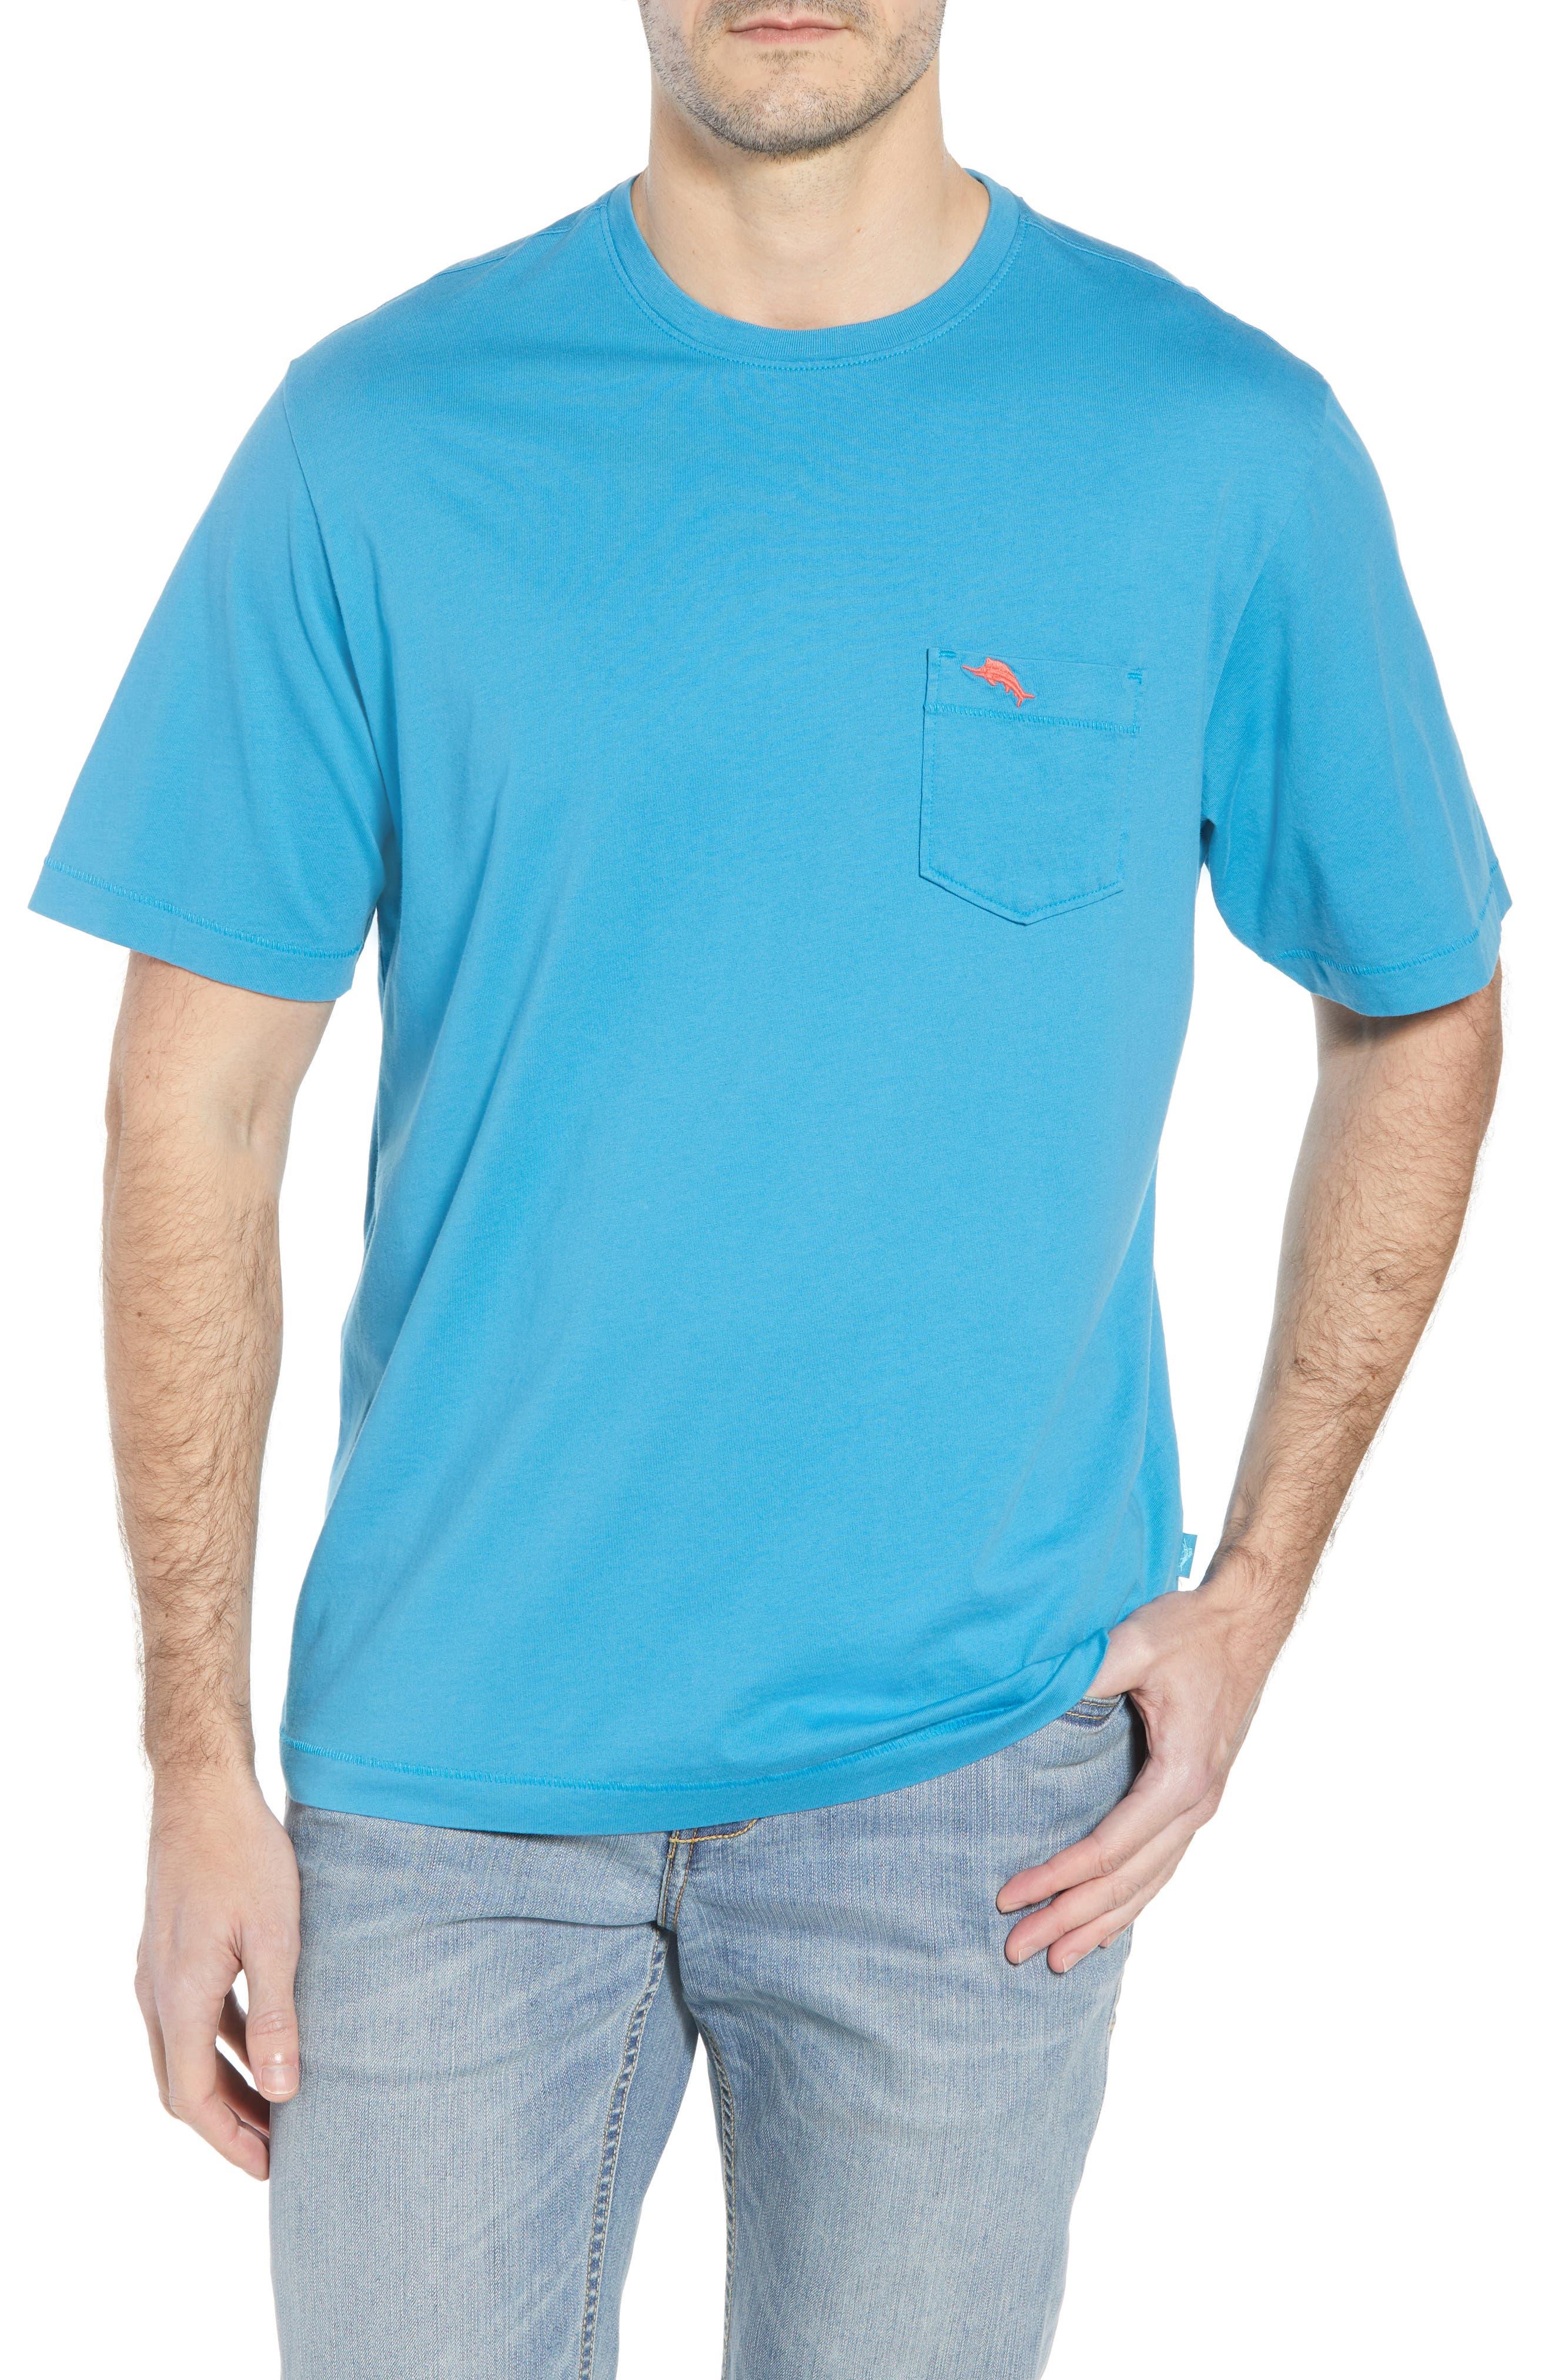 TOMMY BAHAMA,                             New Bali Sky Pima Cotton Pocket T-Shirt,                             Main thumbnail 1, color,                             410